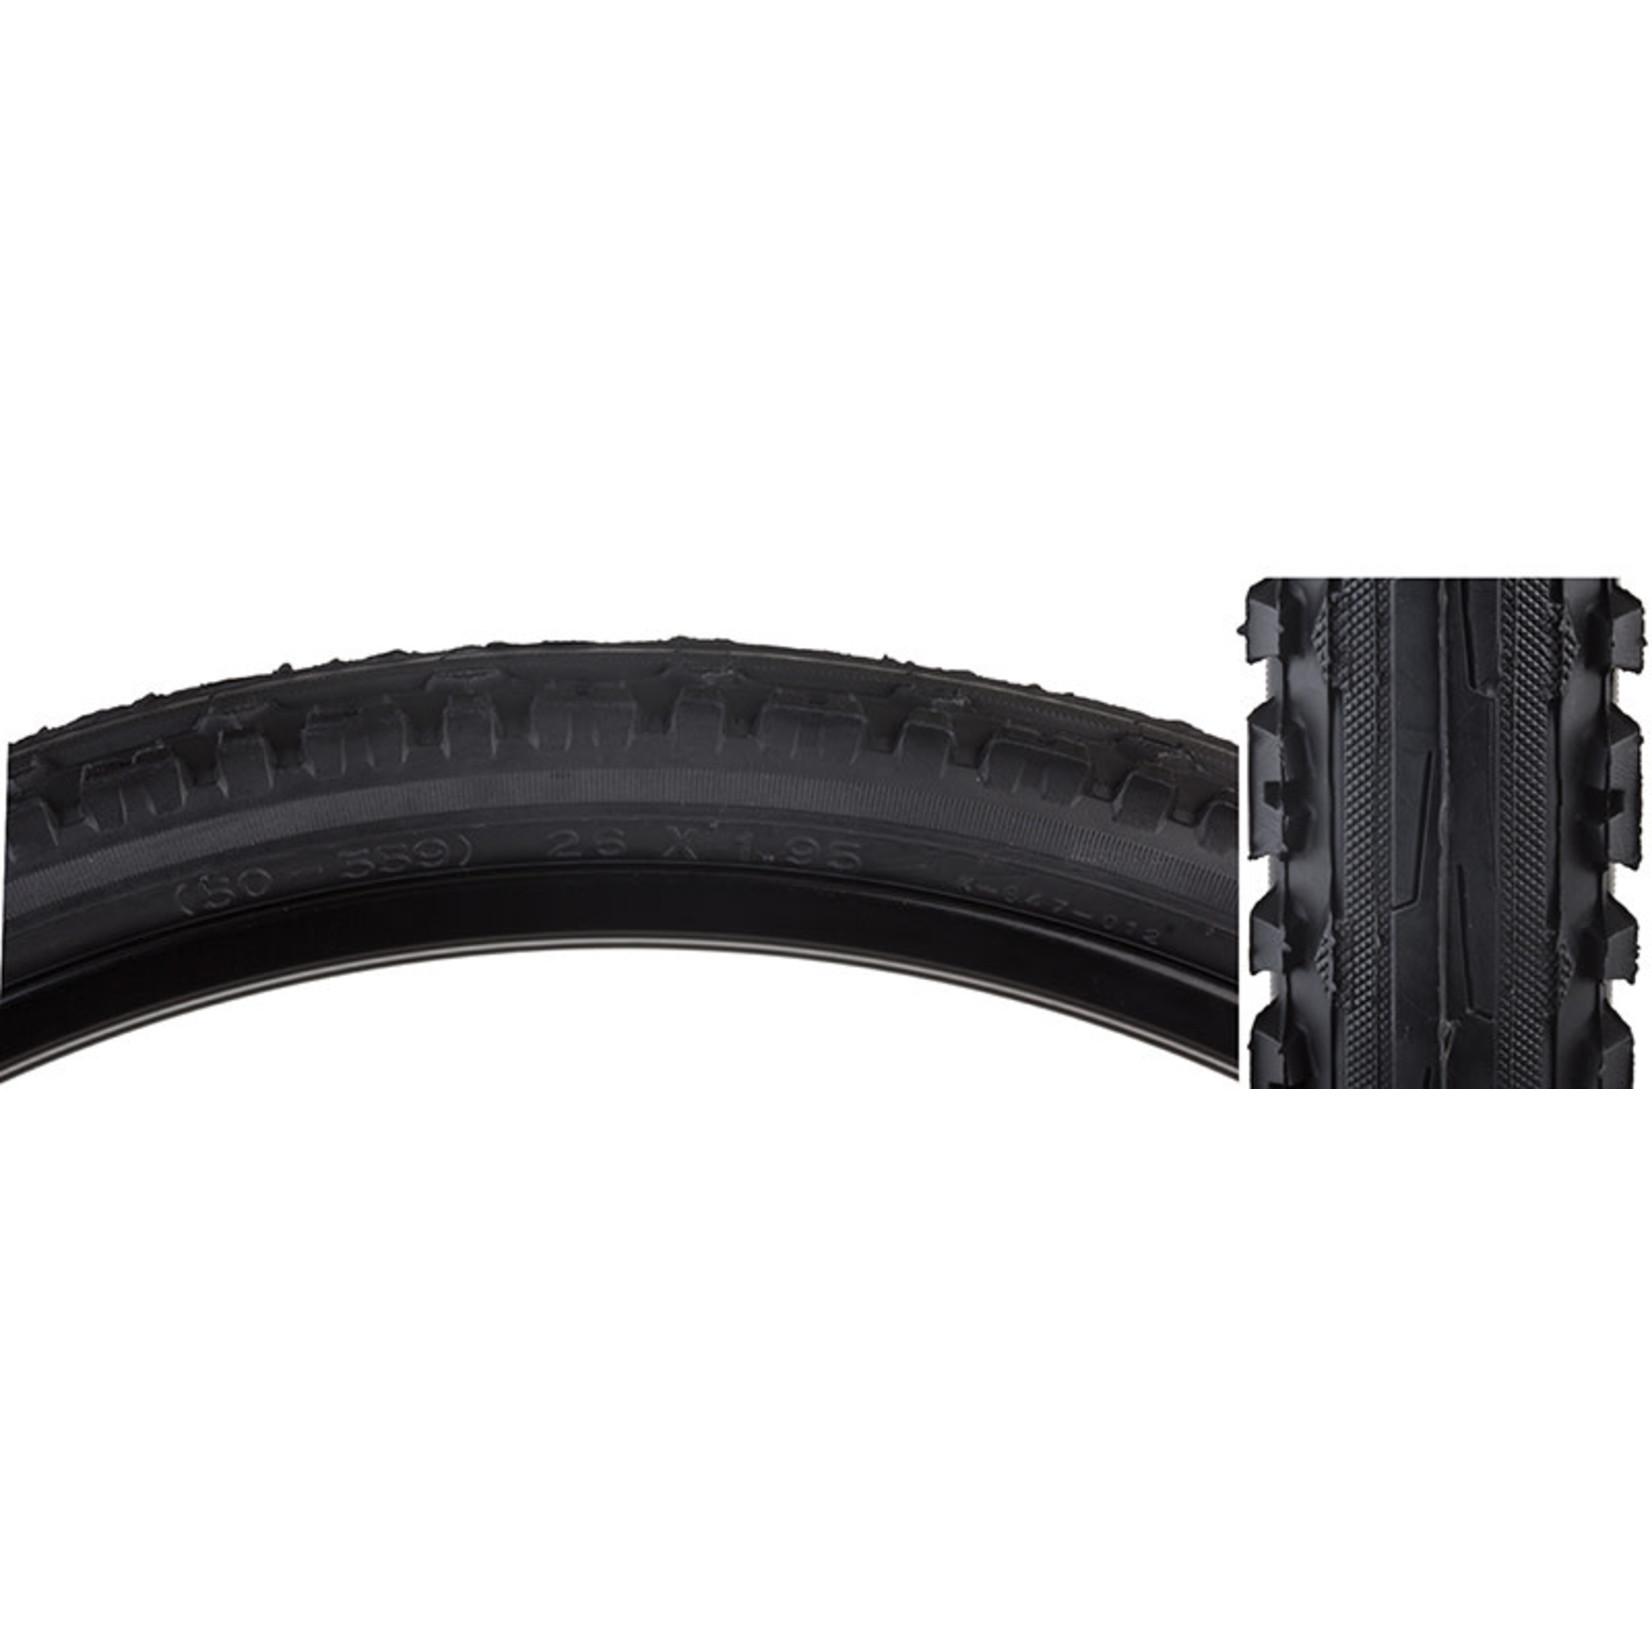 Sunlite Krossplus Tire 26 x 1.95